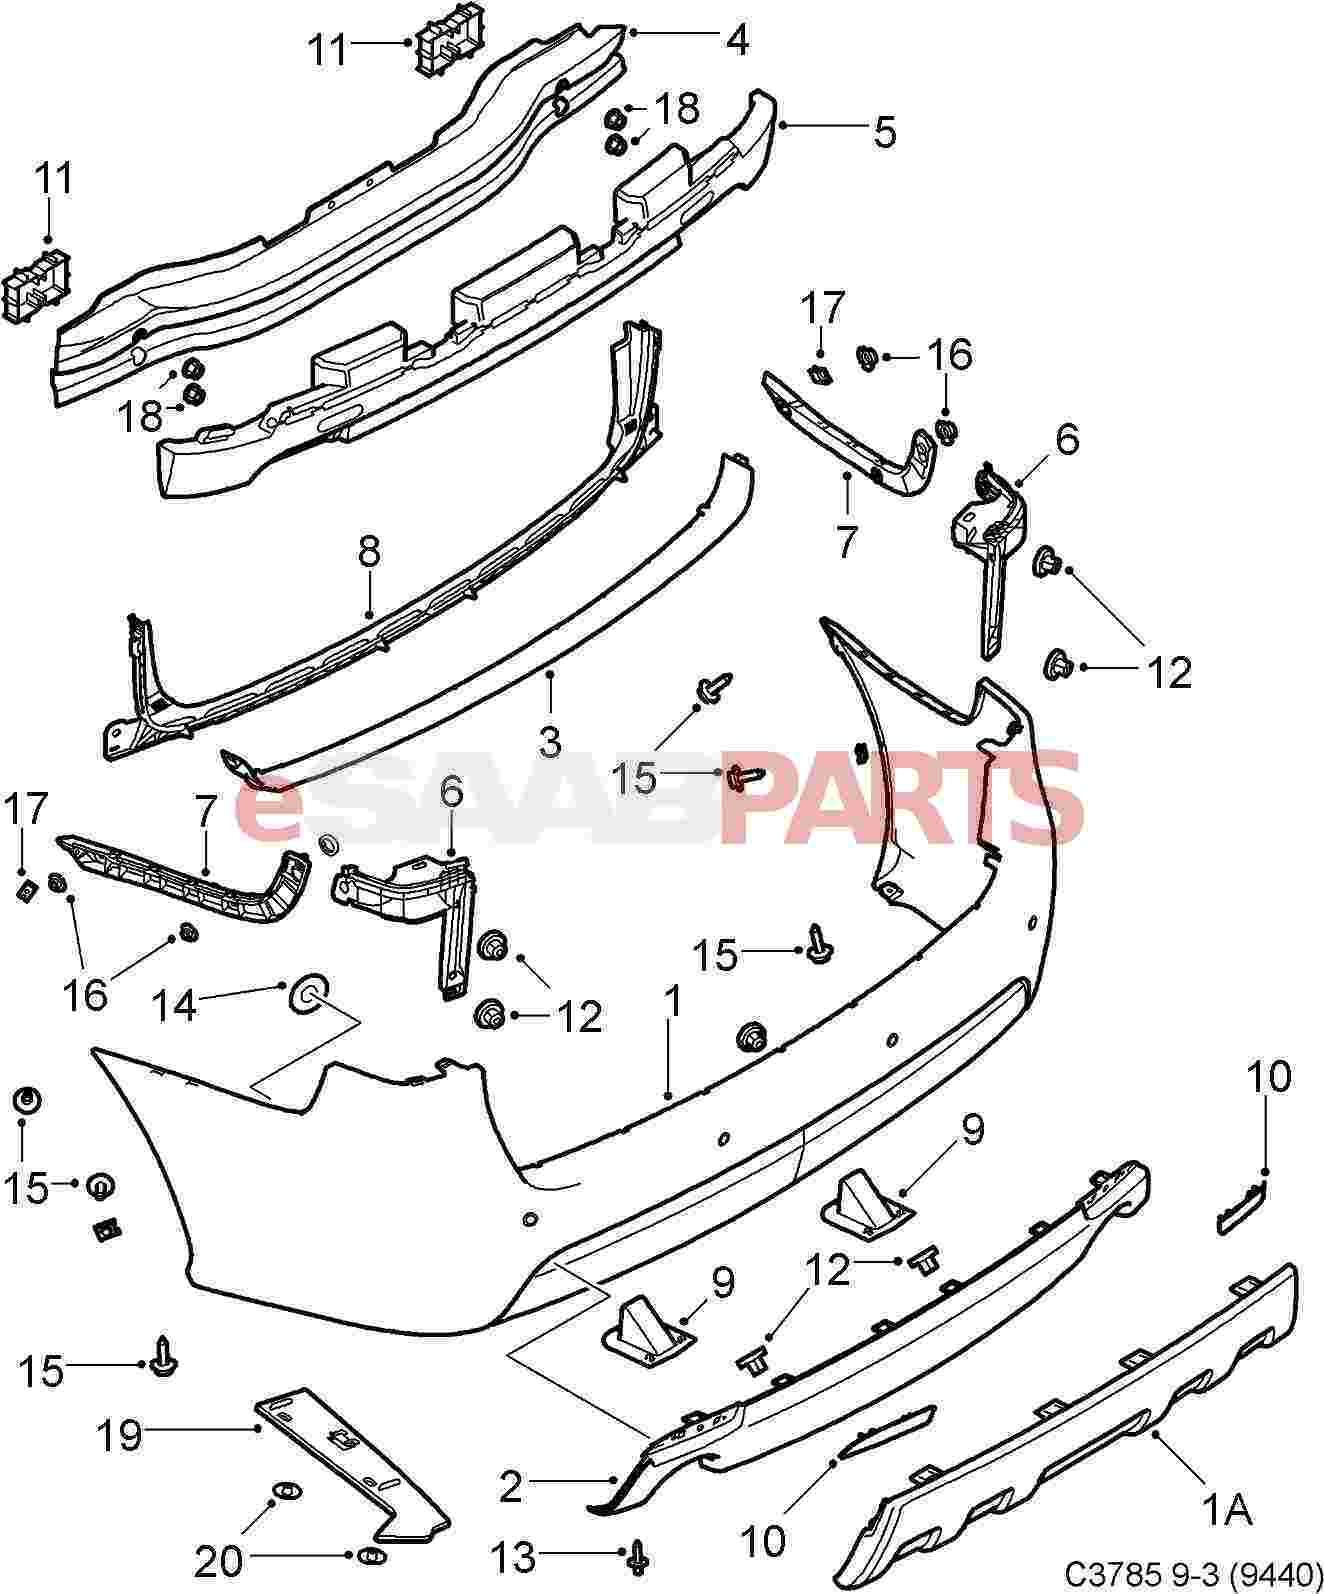 ford focus exhaust system diagram domestic wiring uk fiesta rear bumper parts imageresizertool com